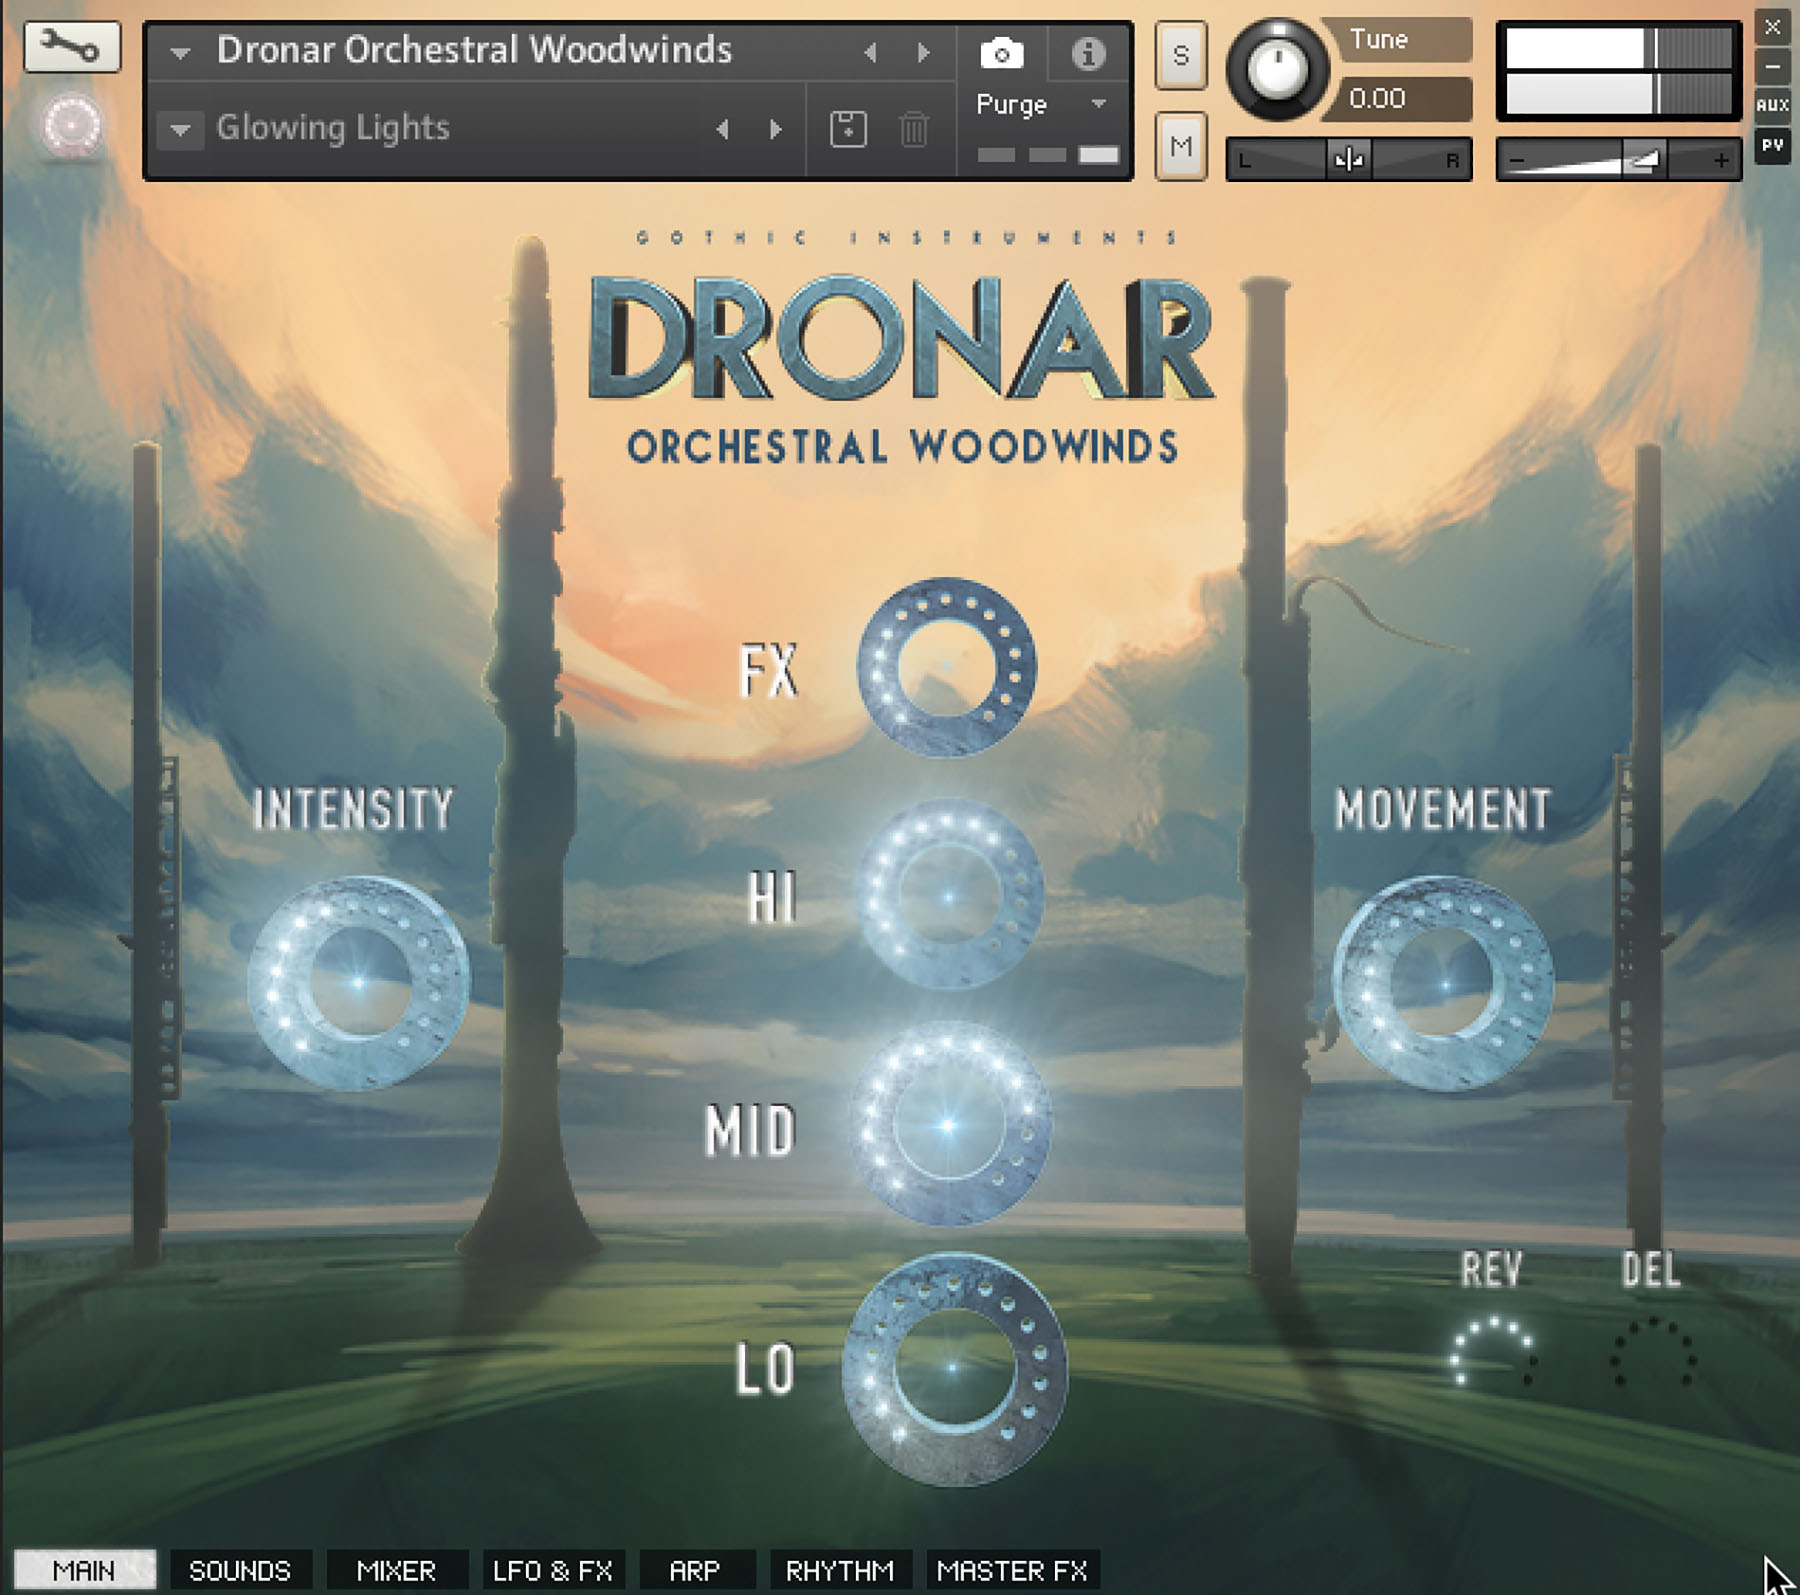 News: Gothic Instruments enthüllt Klangflächen-Erzeuger Dronar Orchestral Woodwinds